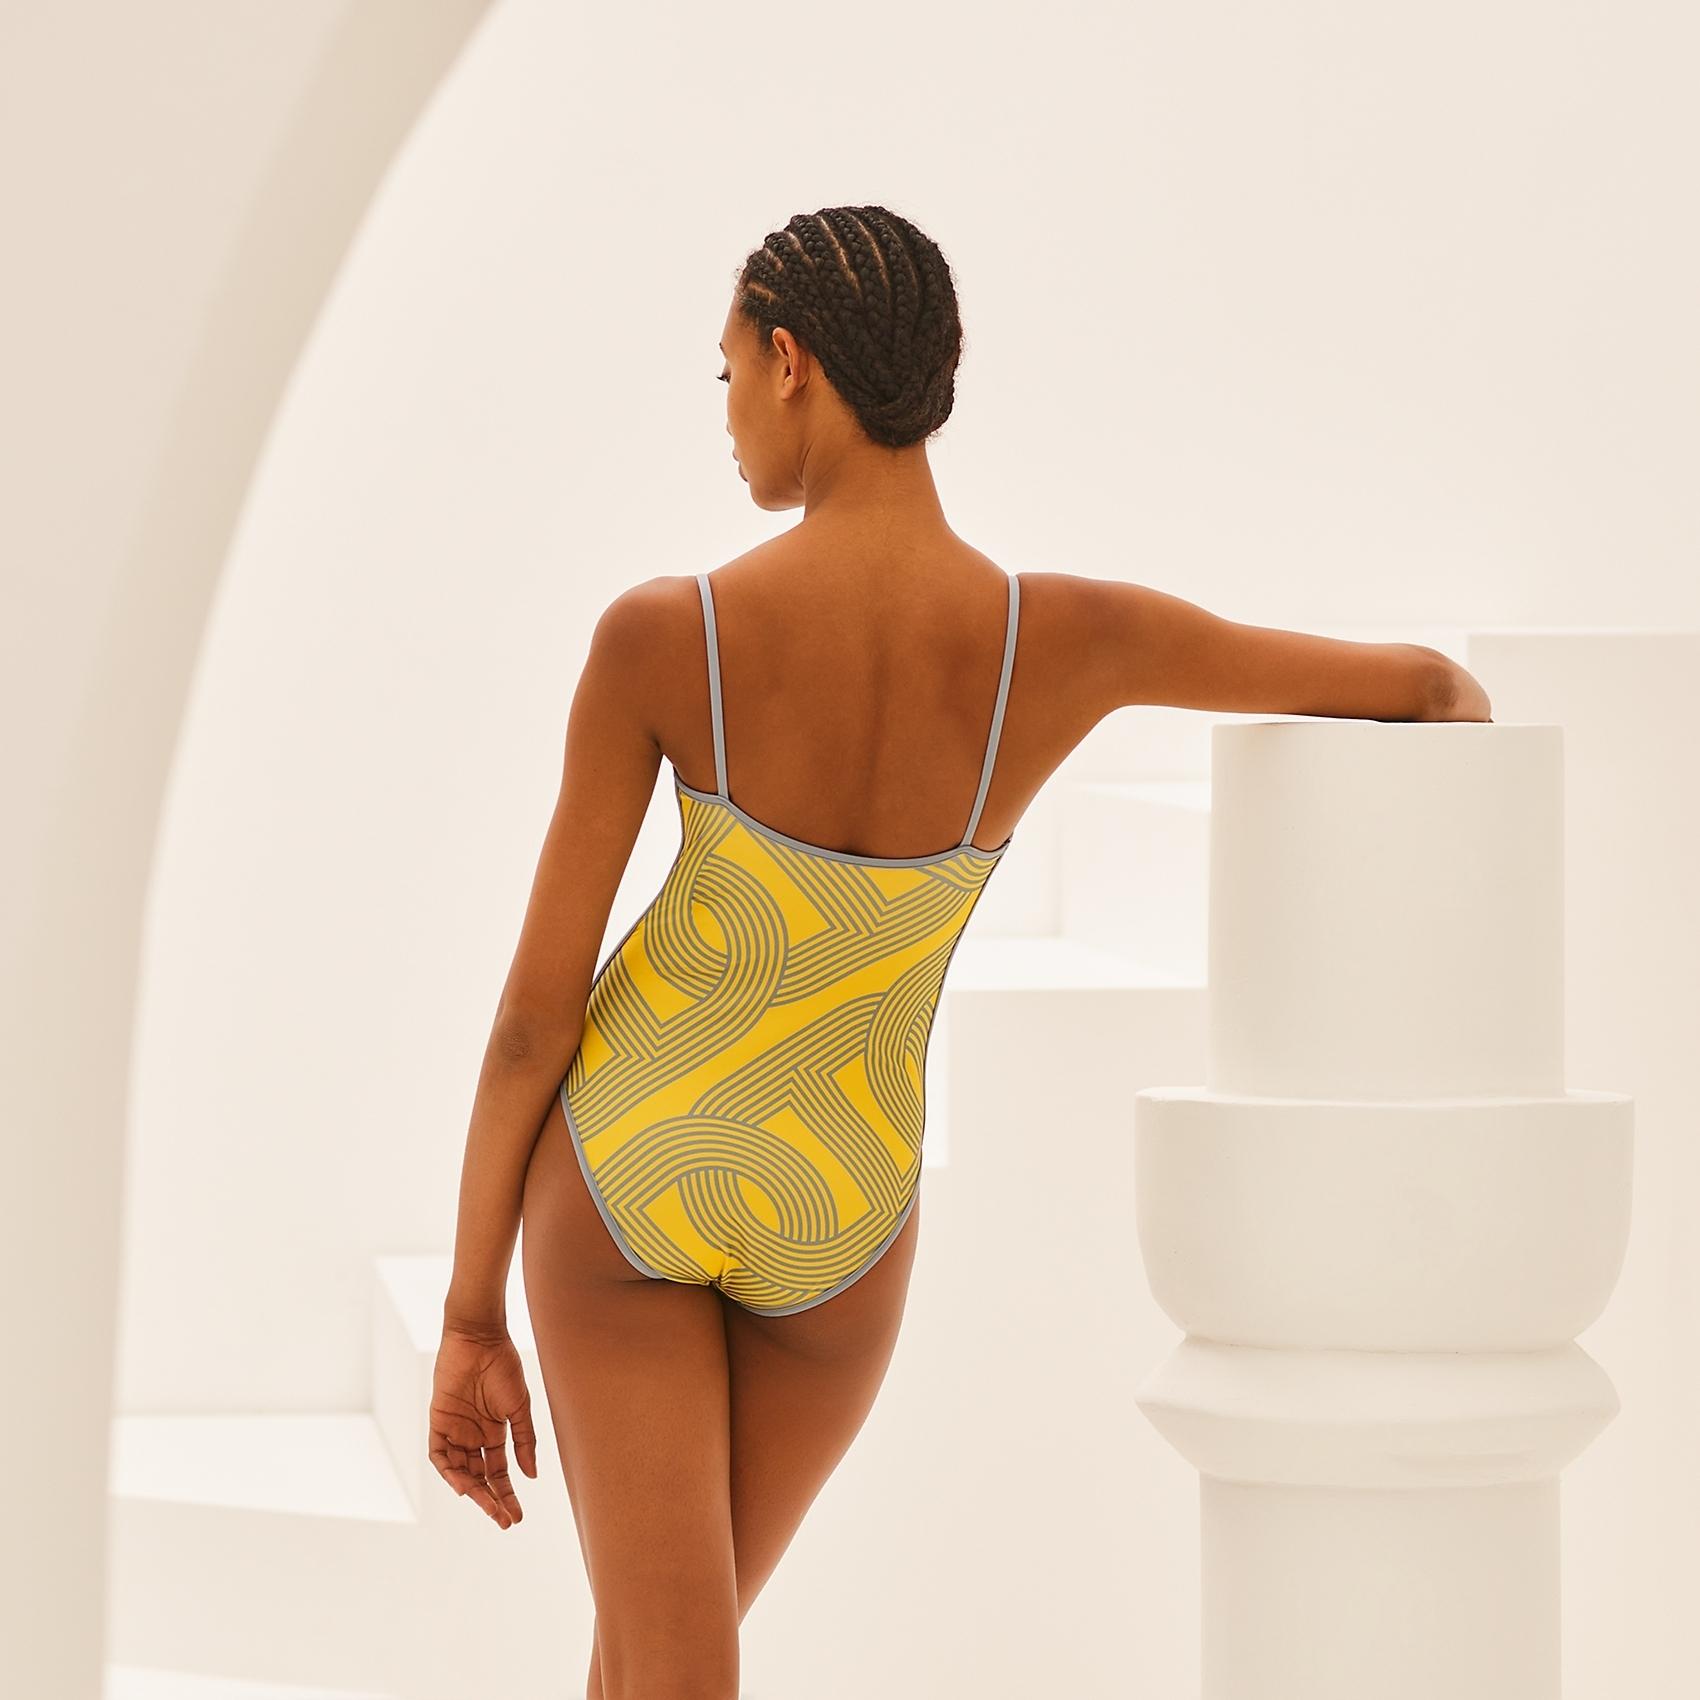 HERMES Tiki swimsuit - Jaune Citron